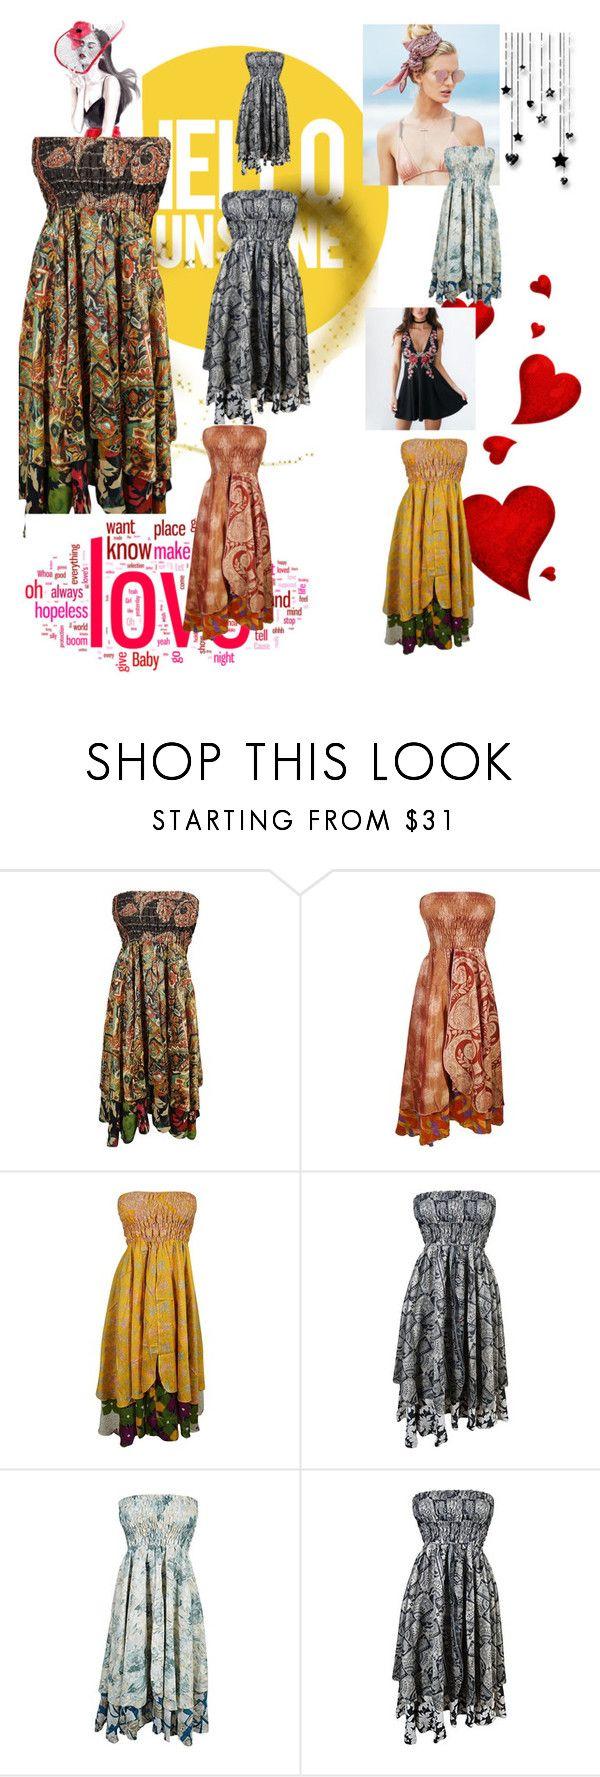 """Boho Sari Dress"" by tarini-tarini ❤ liked on Polyvore featuring Beach Riot and vintage"